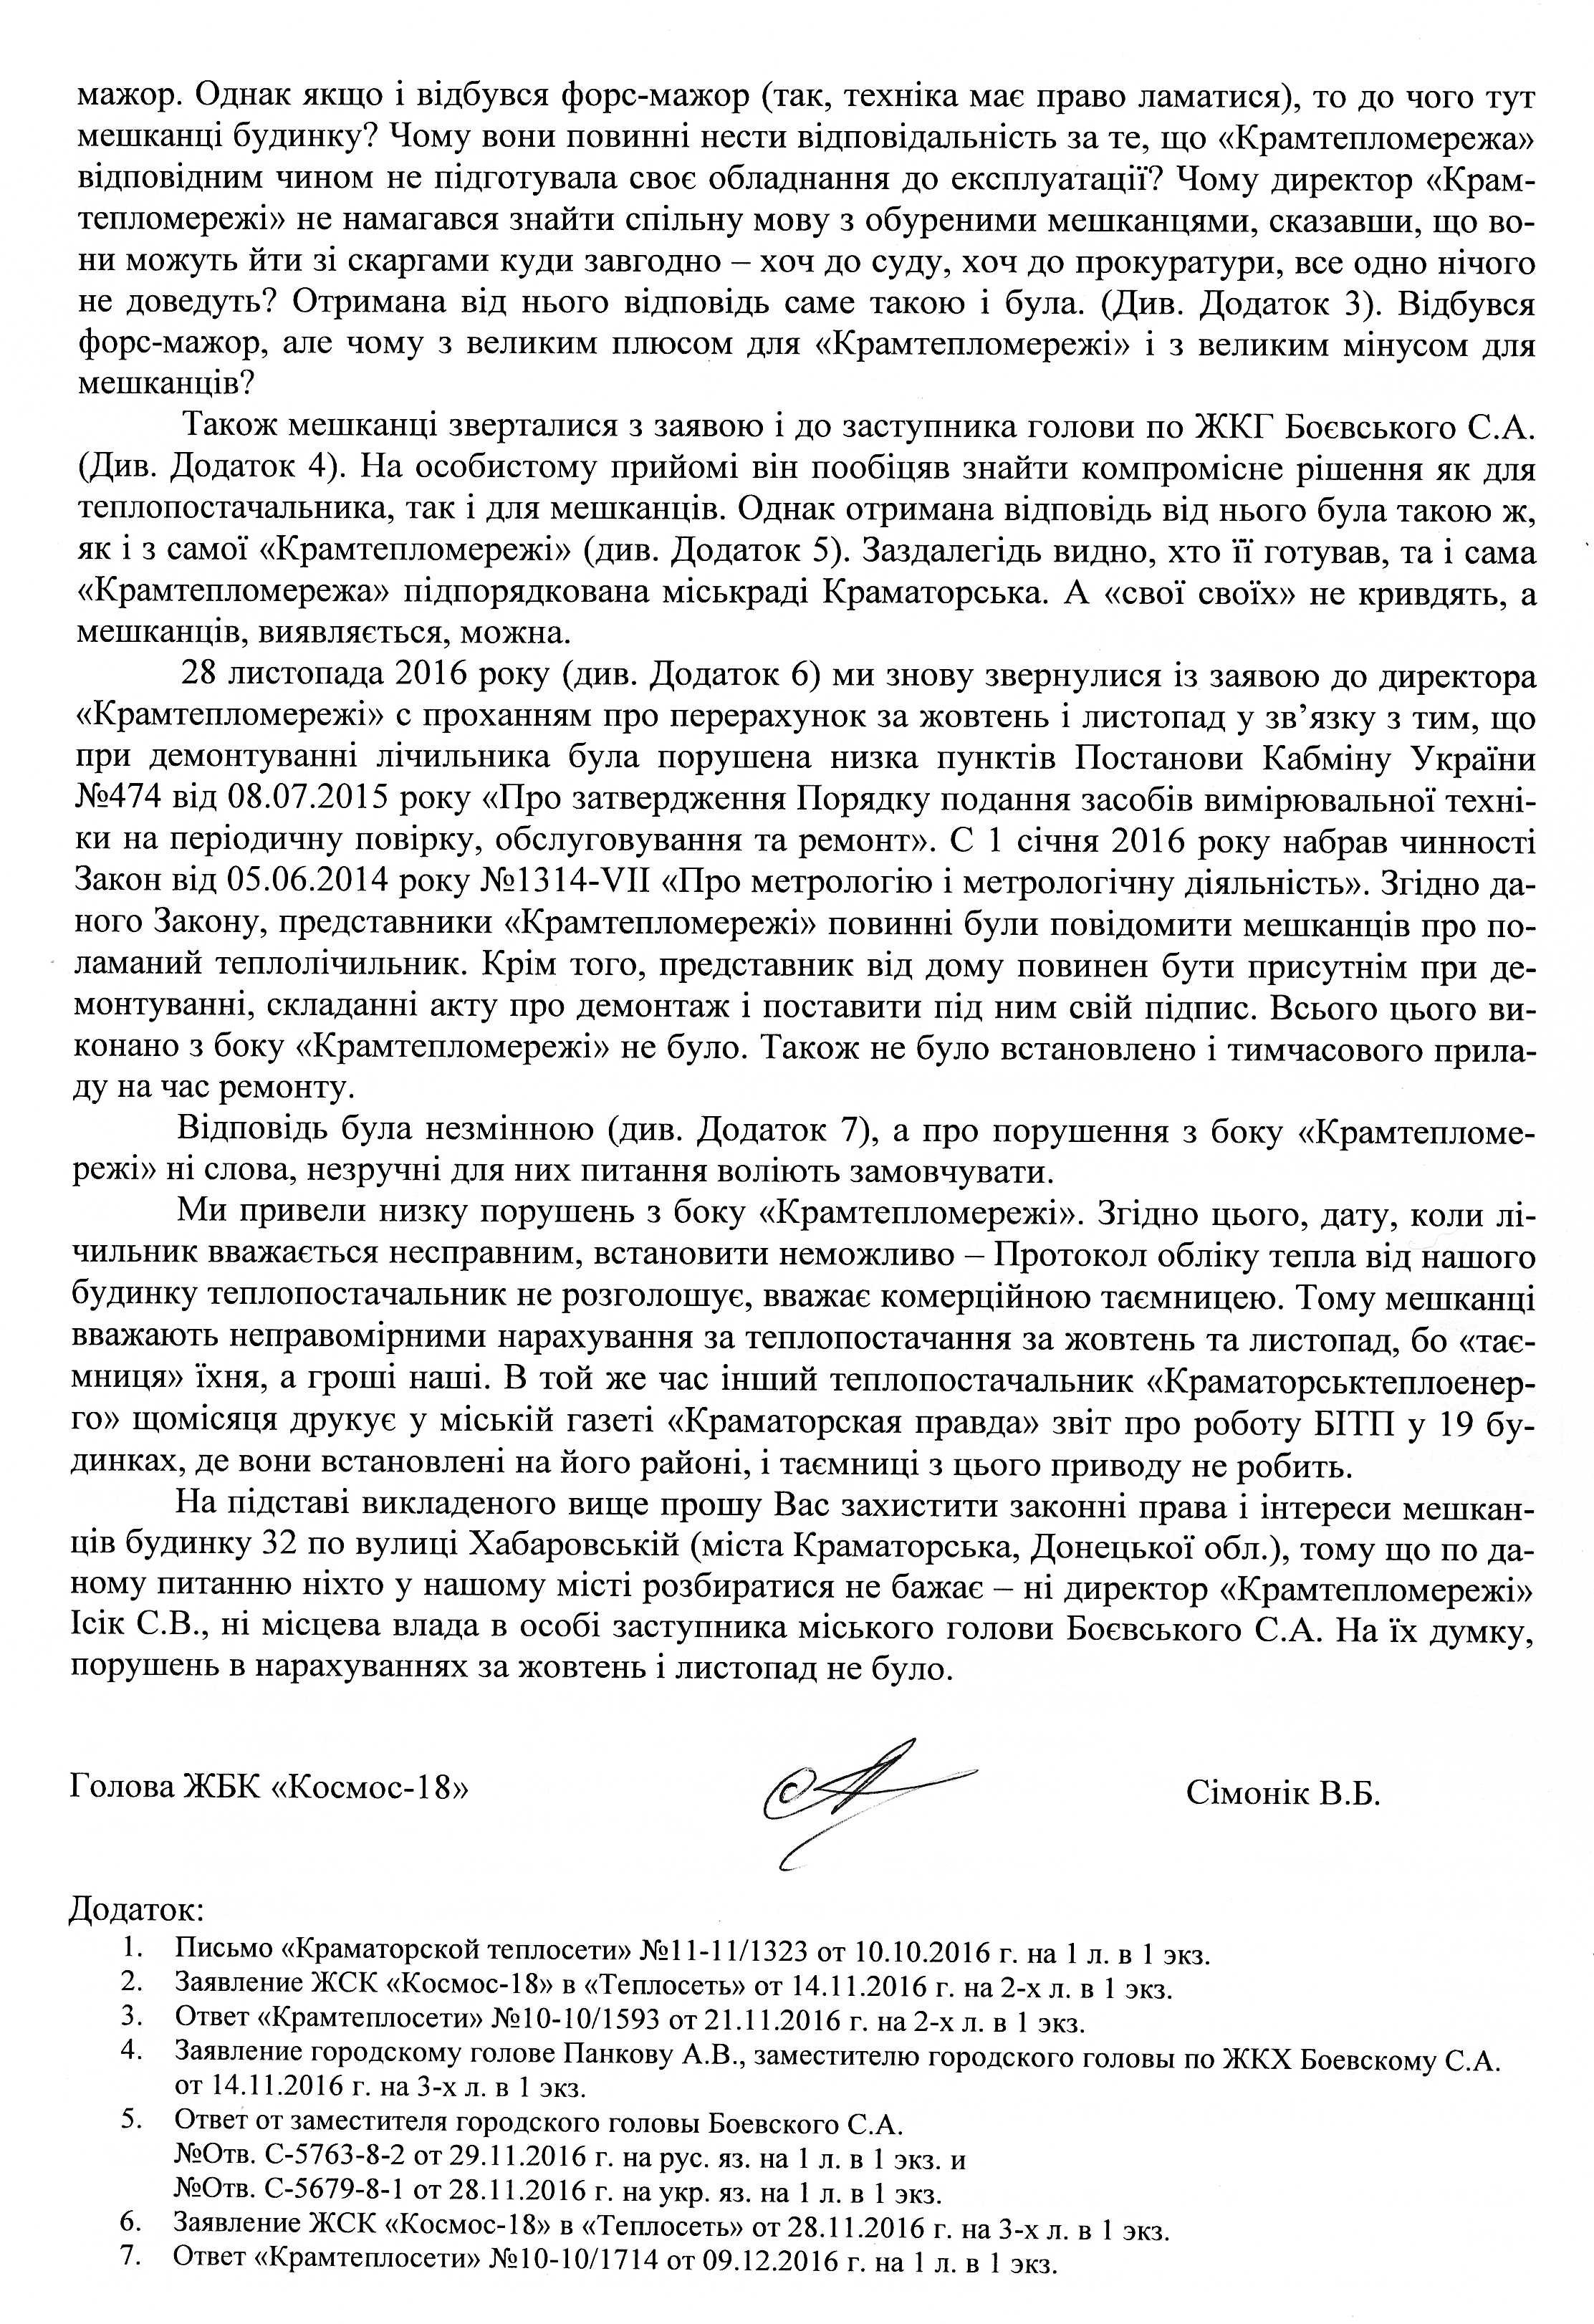 https://img-fotki.yandex.ru/get/198860/248142895.0/0_1832af_83a11a06_orig